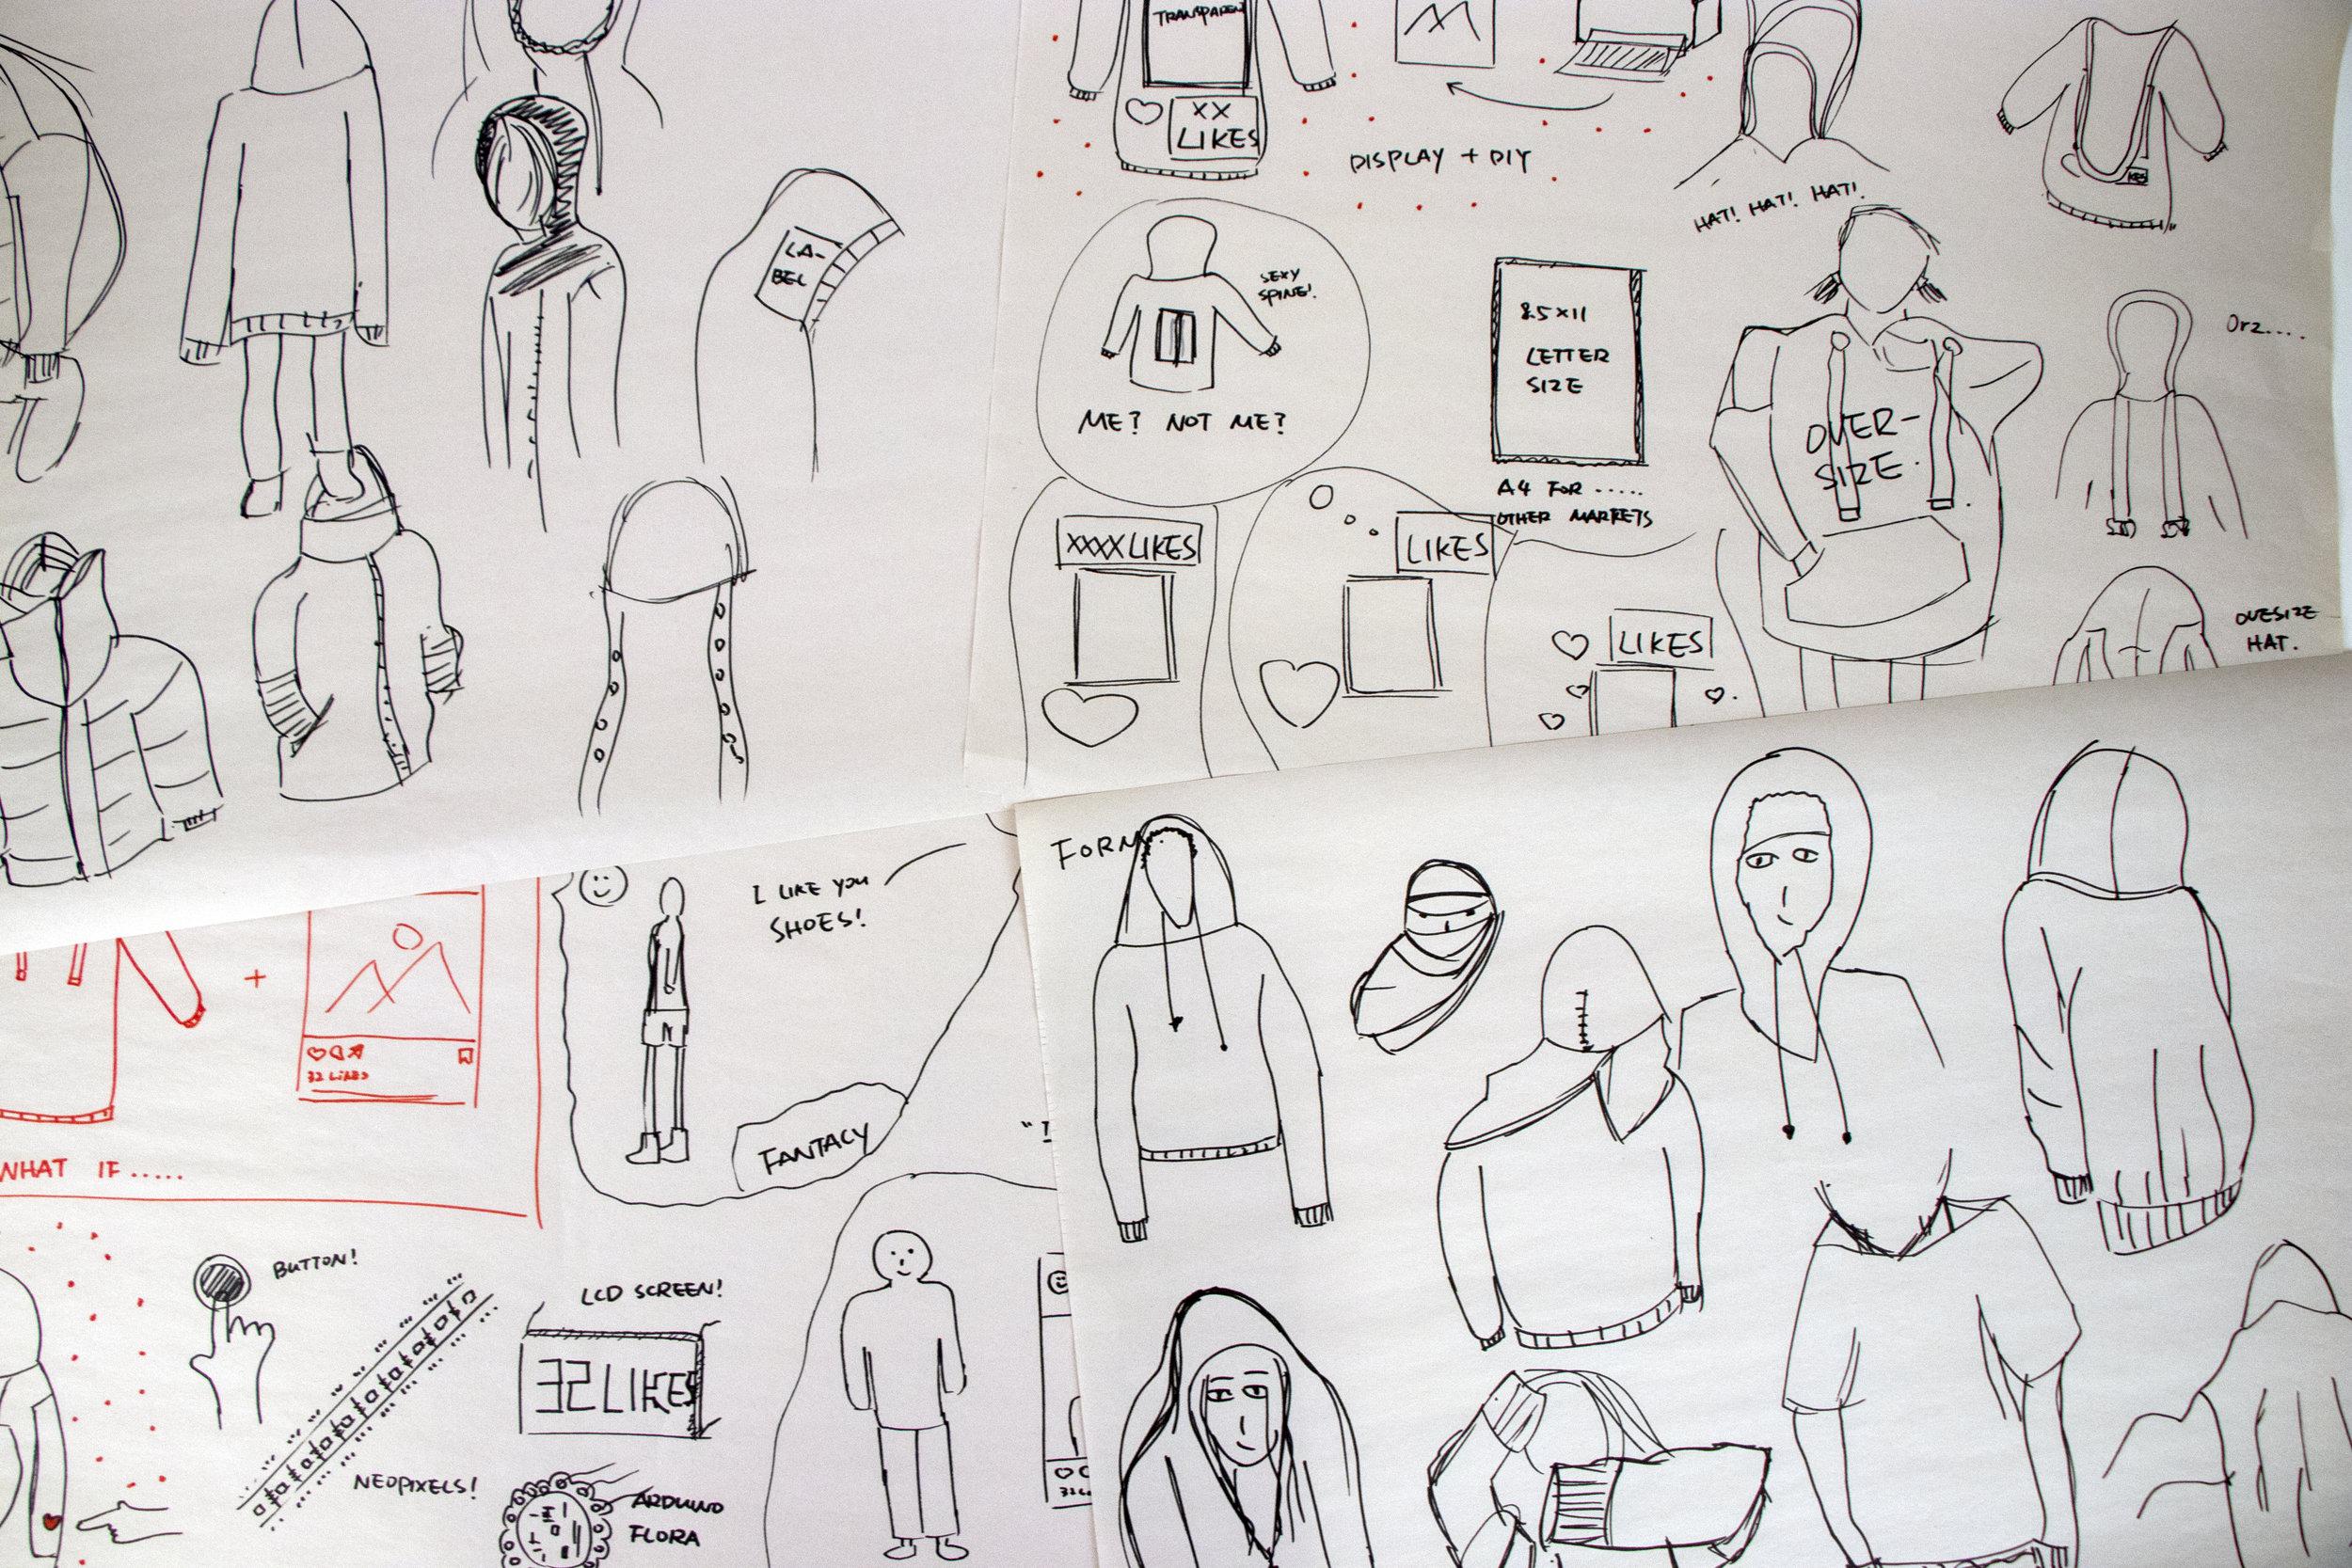 WhoD sketch.jpg